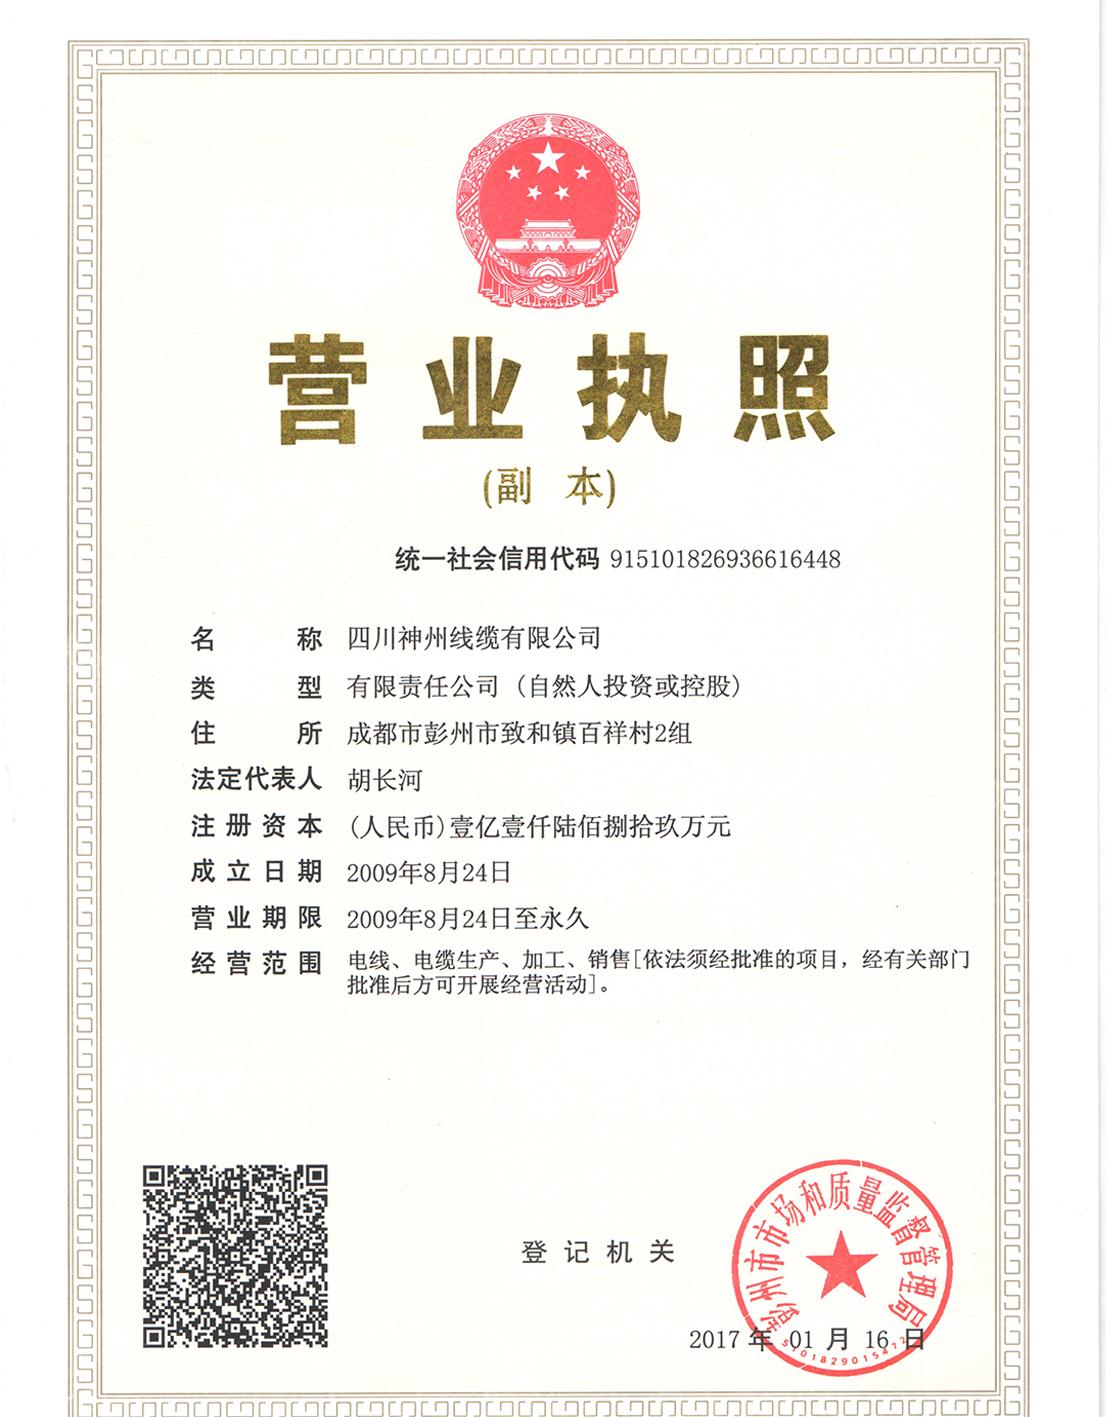 P好证书-c377b382-fb26-40fb-8698-7fbe680ecd60